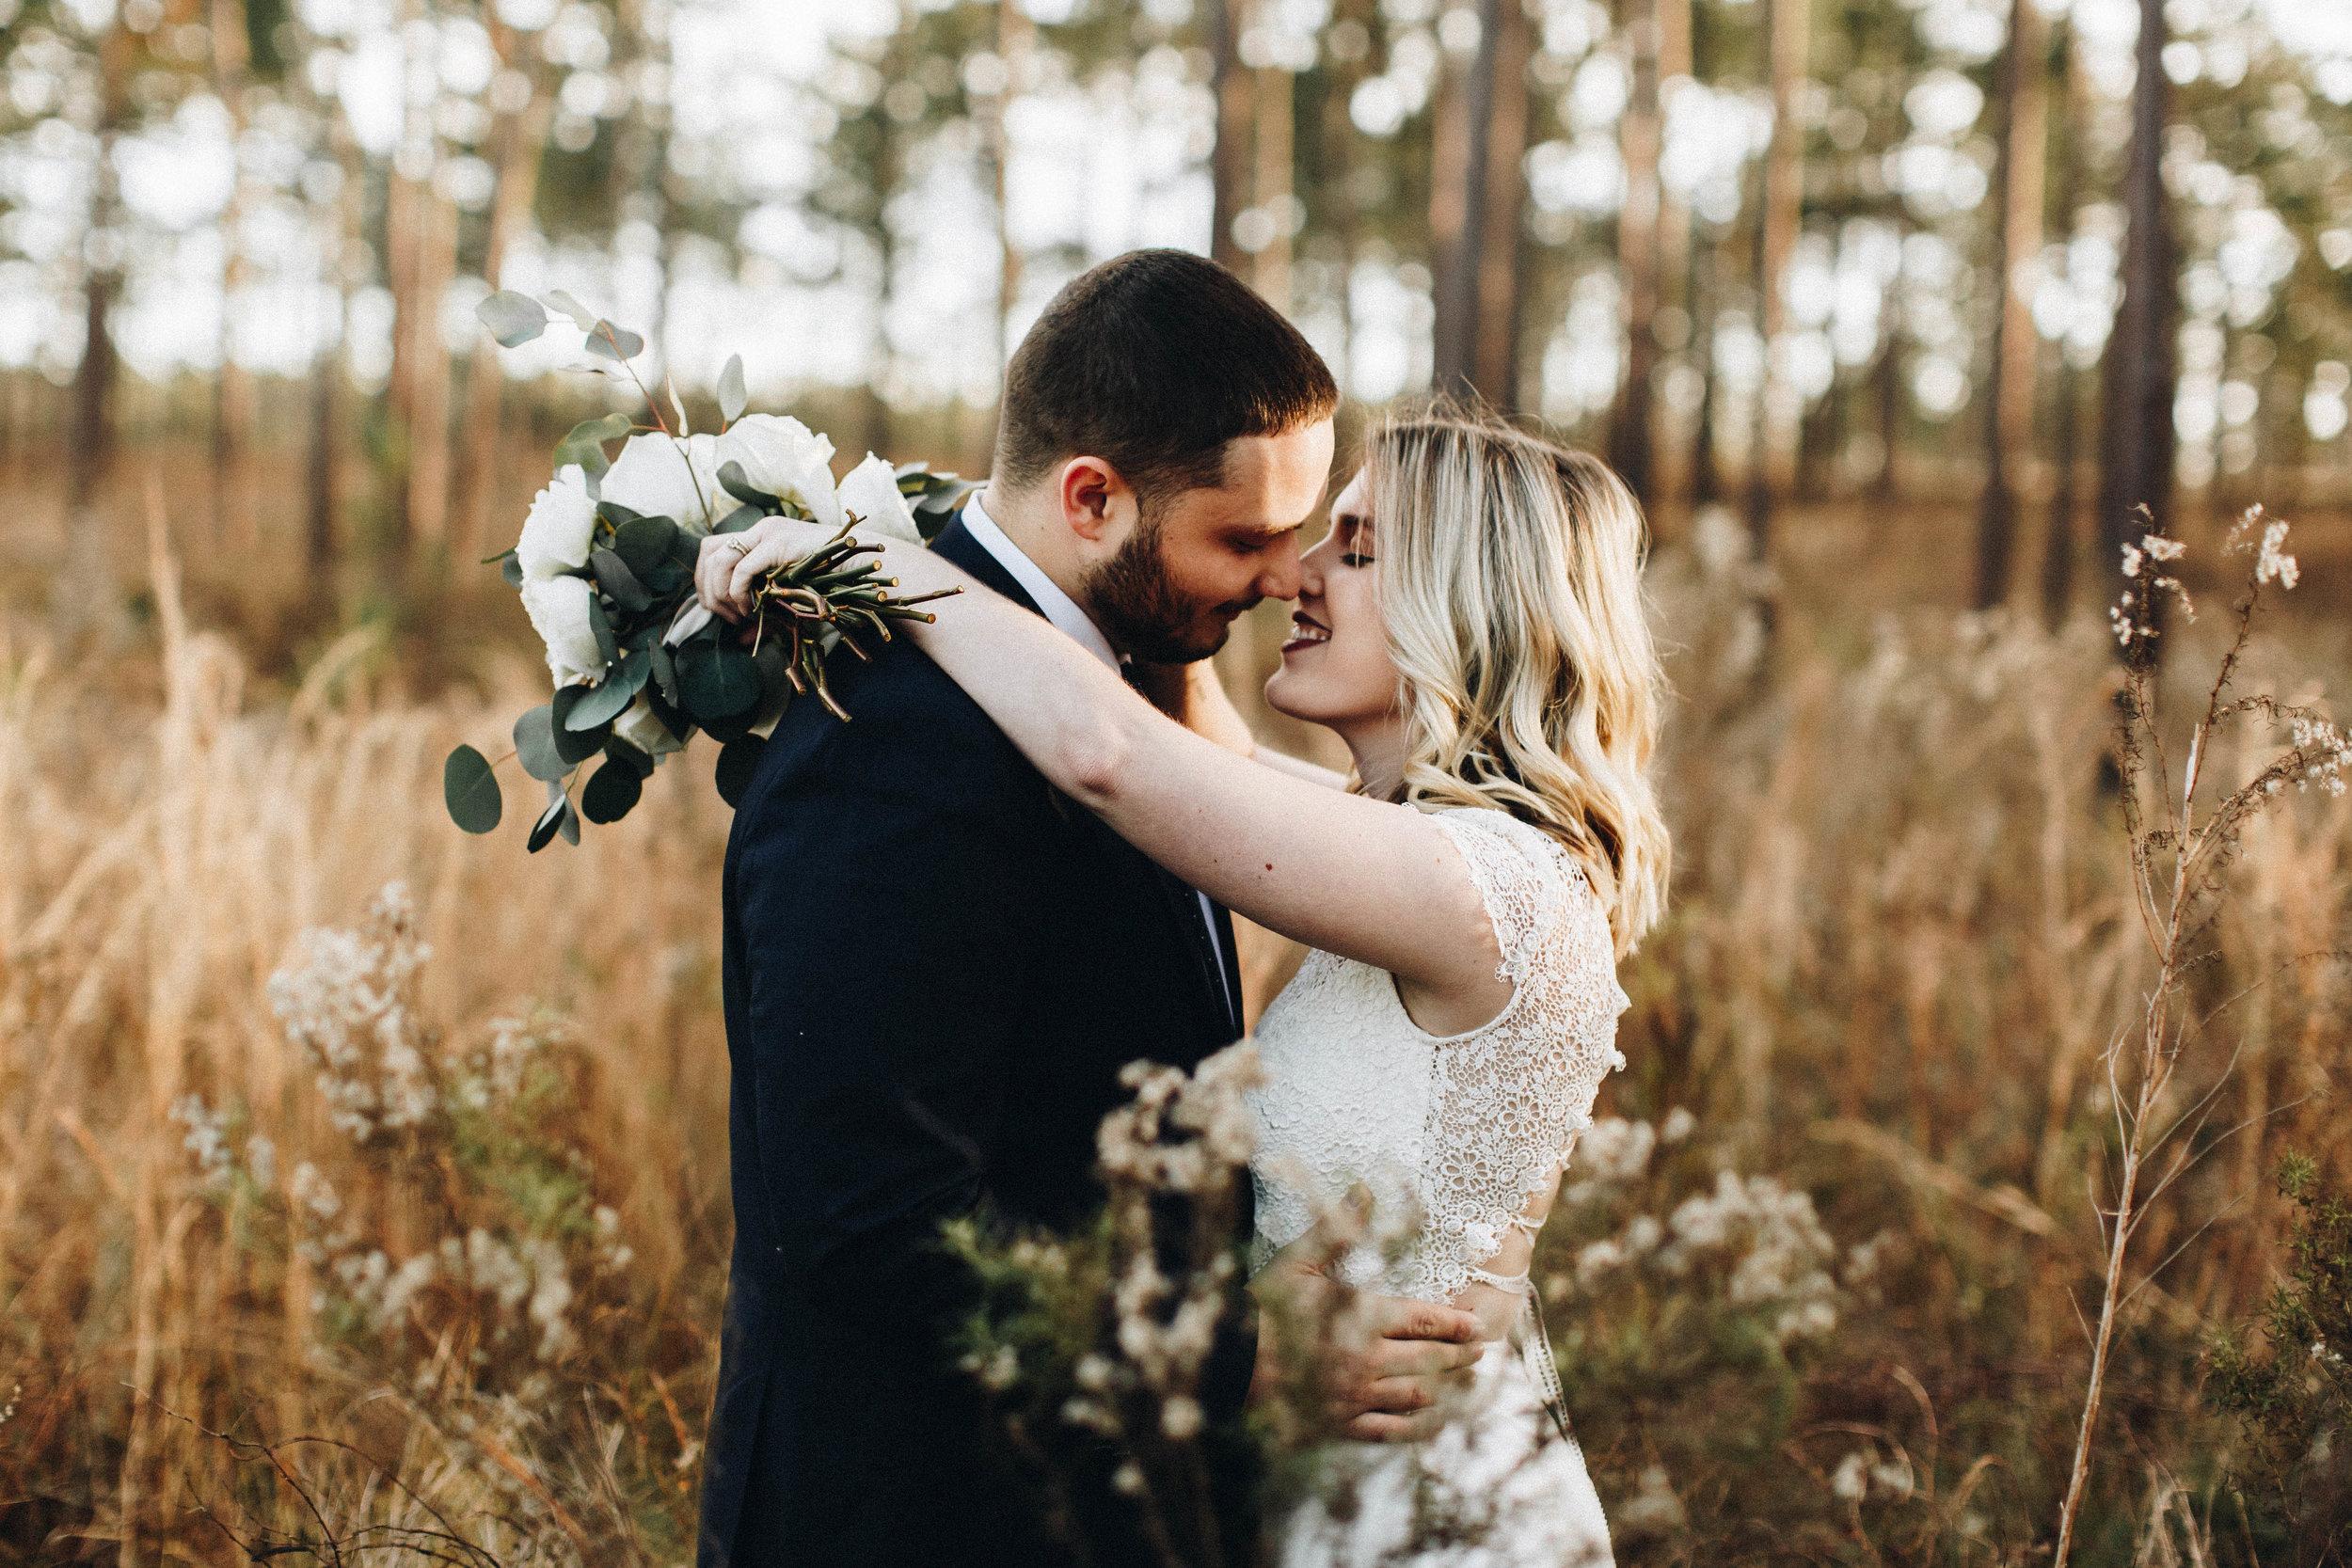 Orlando+wedding+photographer-3.jpeg